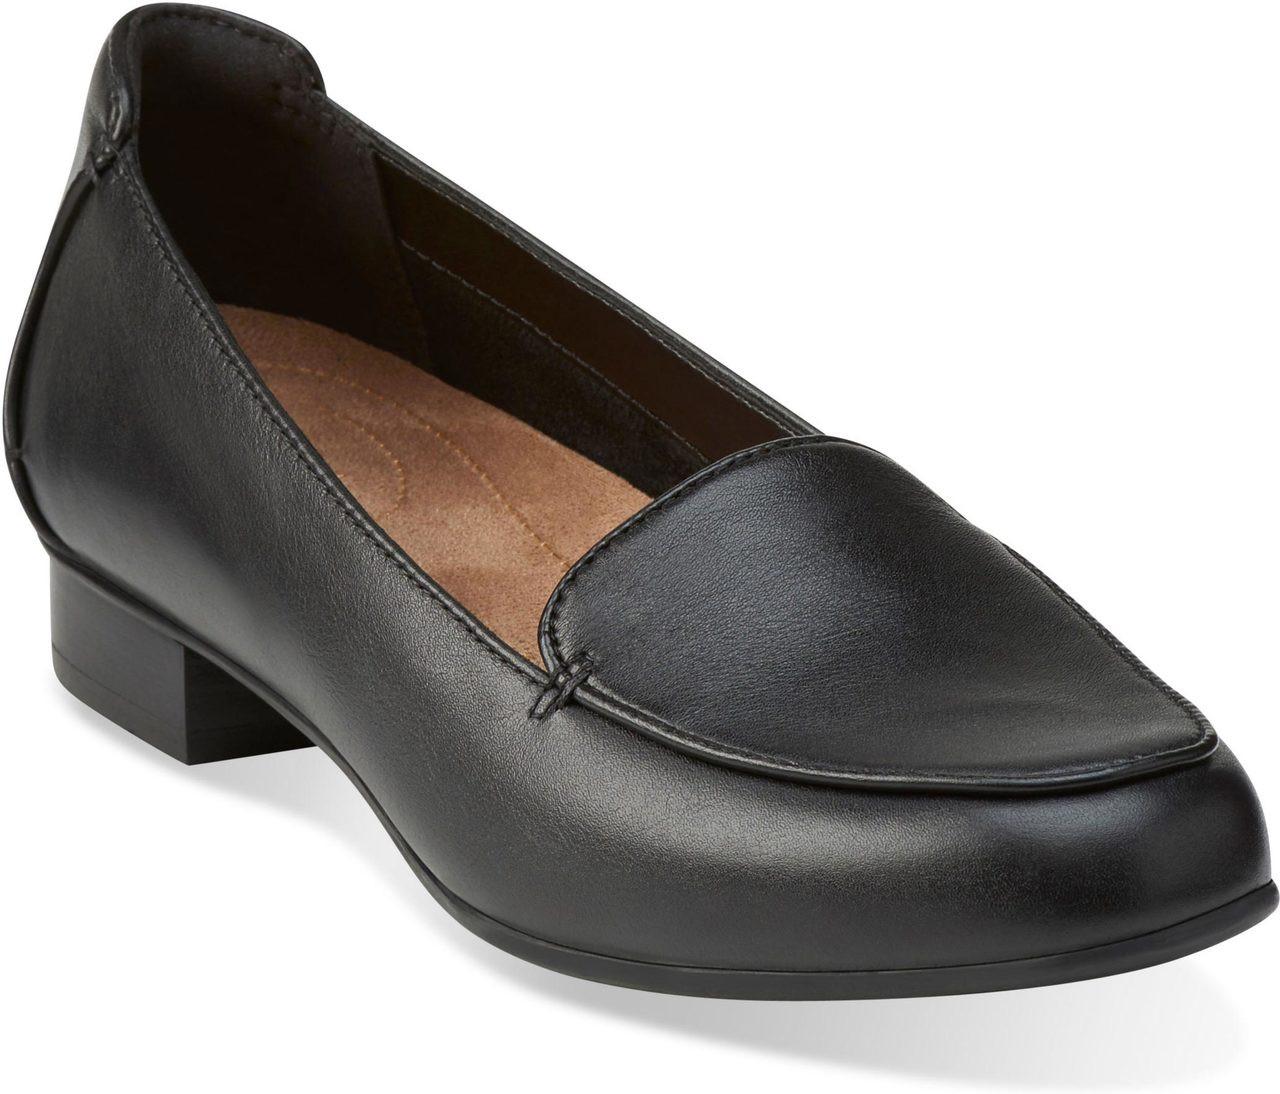 Clarks Ladies Keesha Luca Slip On Shoe